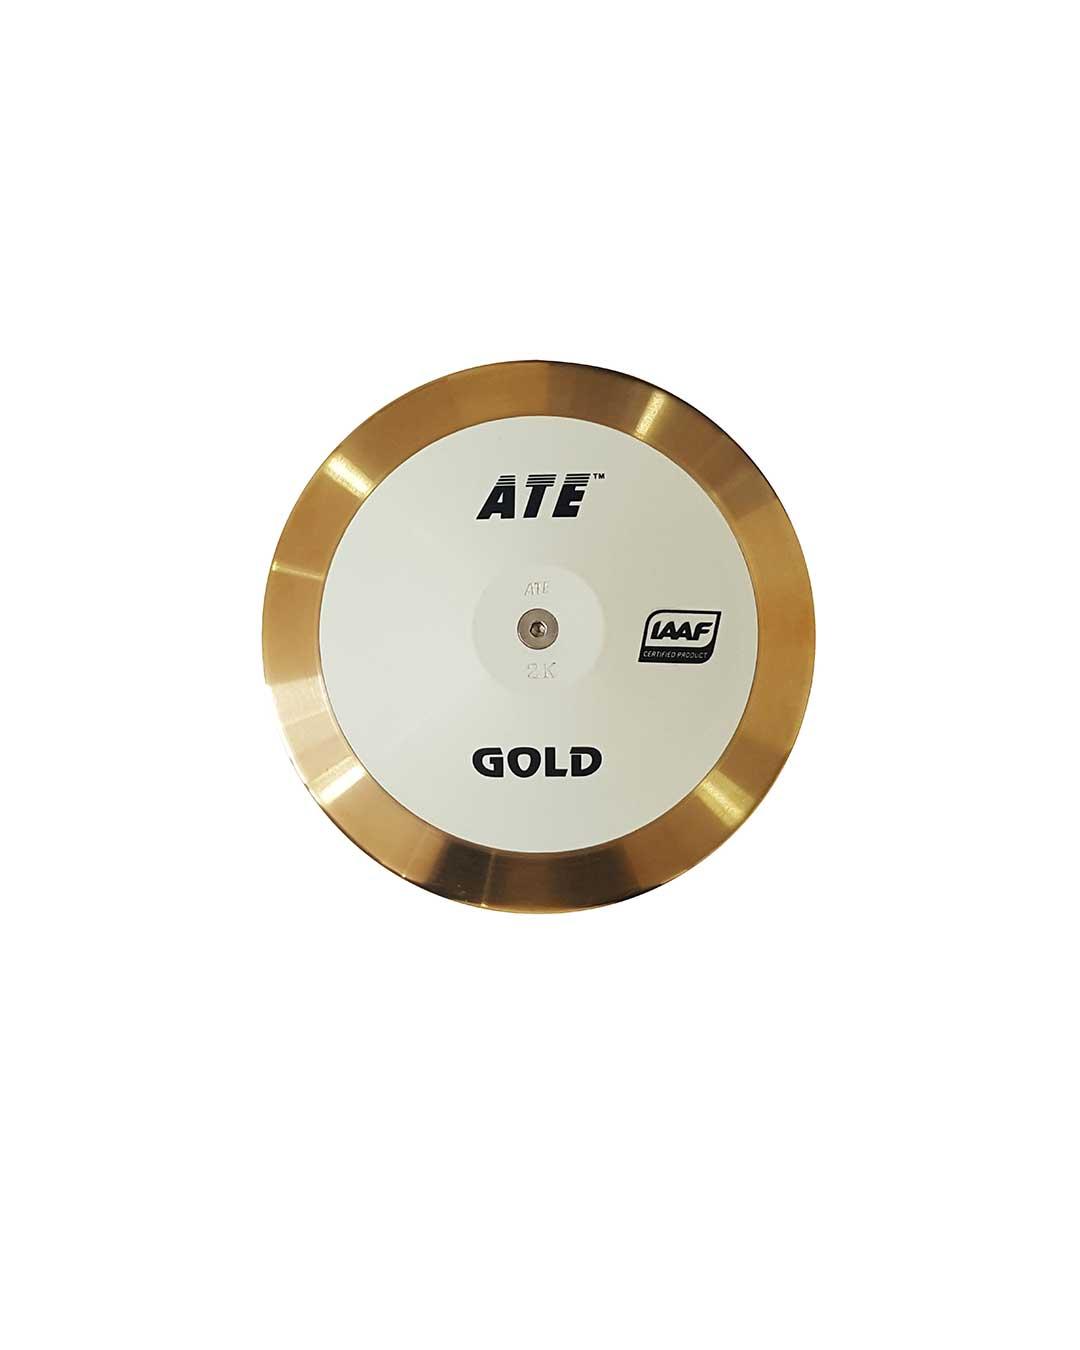 Disco de atletismo Gold (Certificado IAAF)